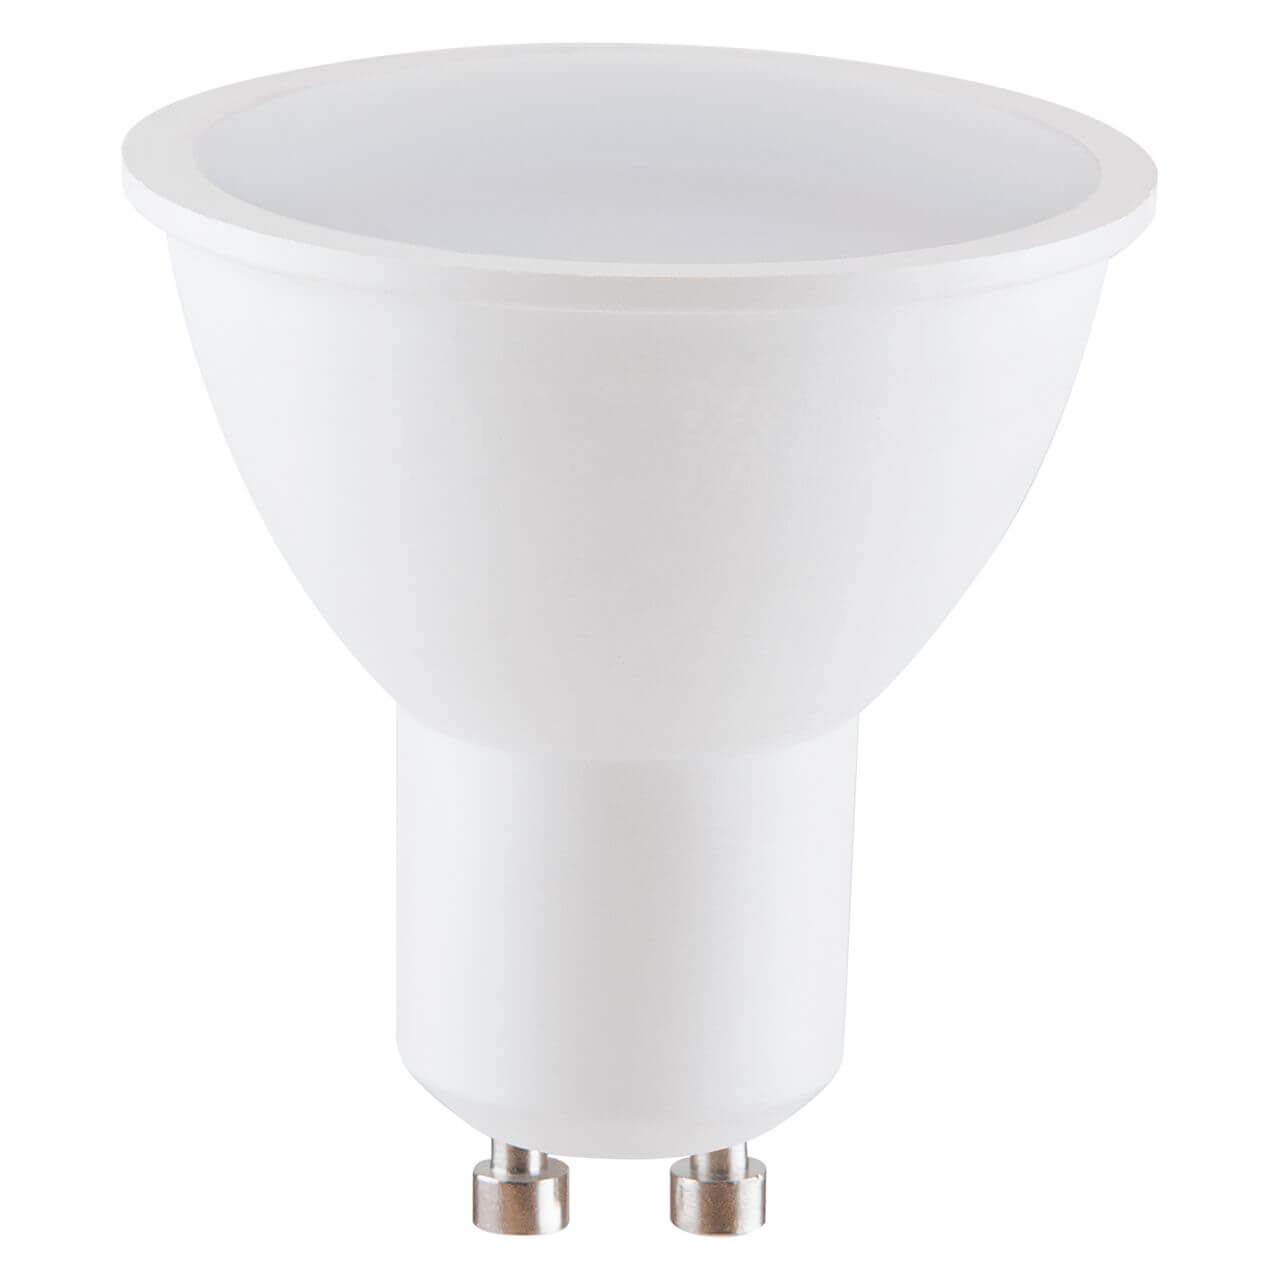 Лампочка Elektrostandard 4690389151712 BLGU10